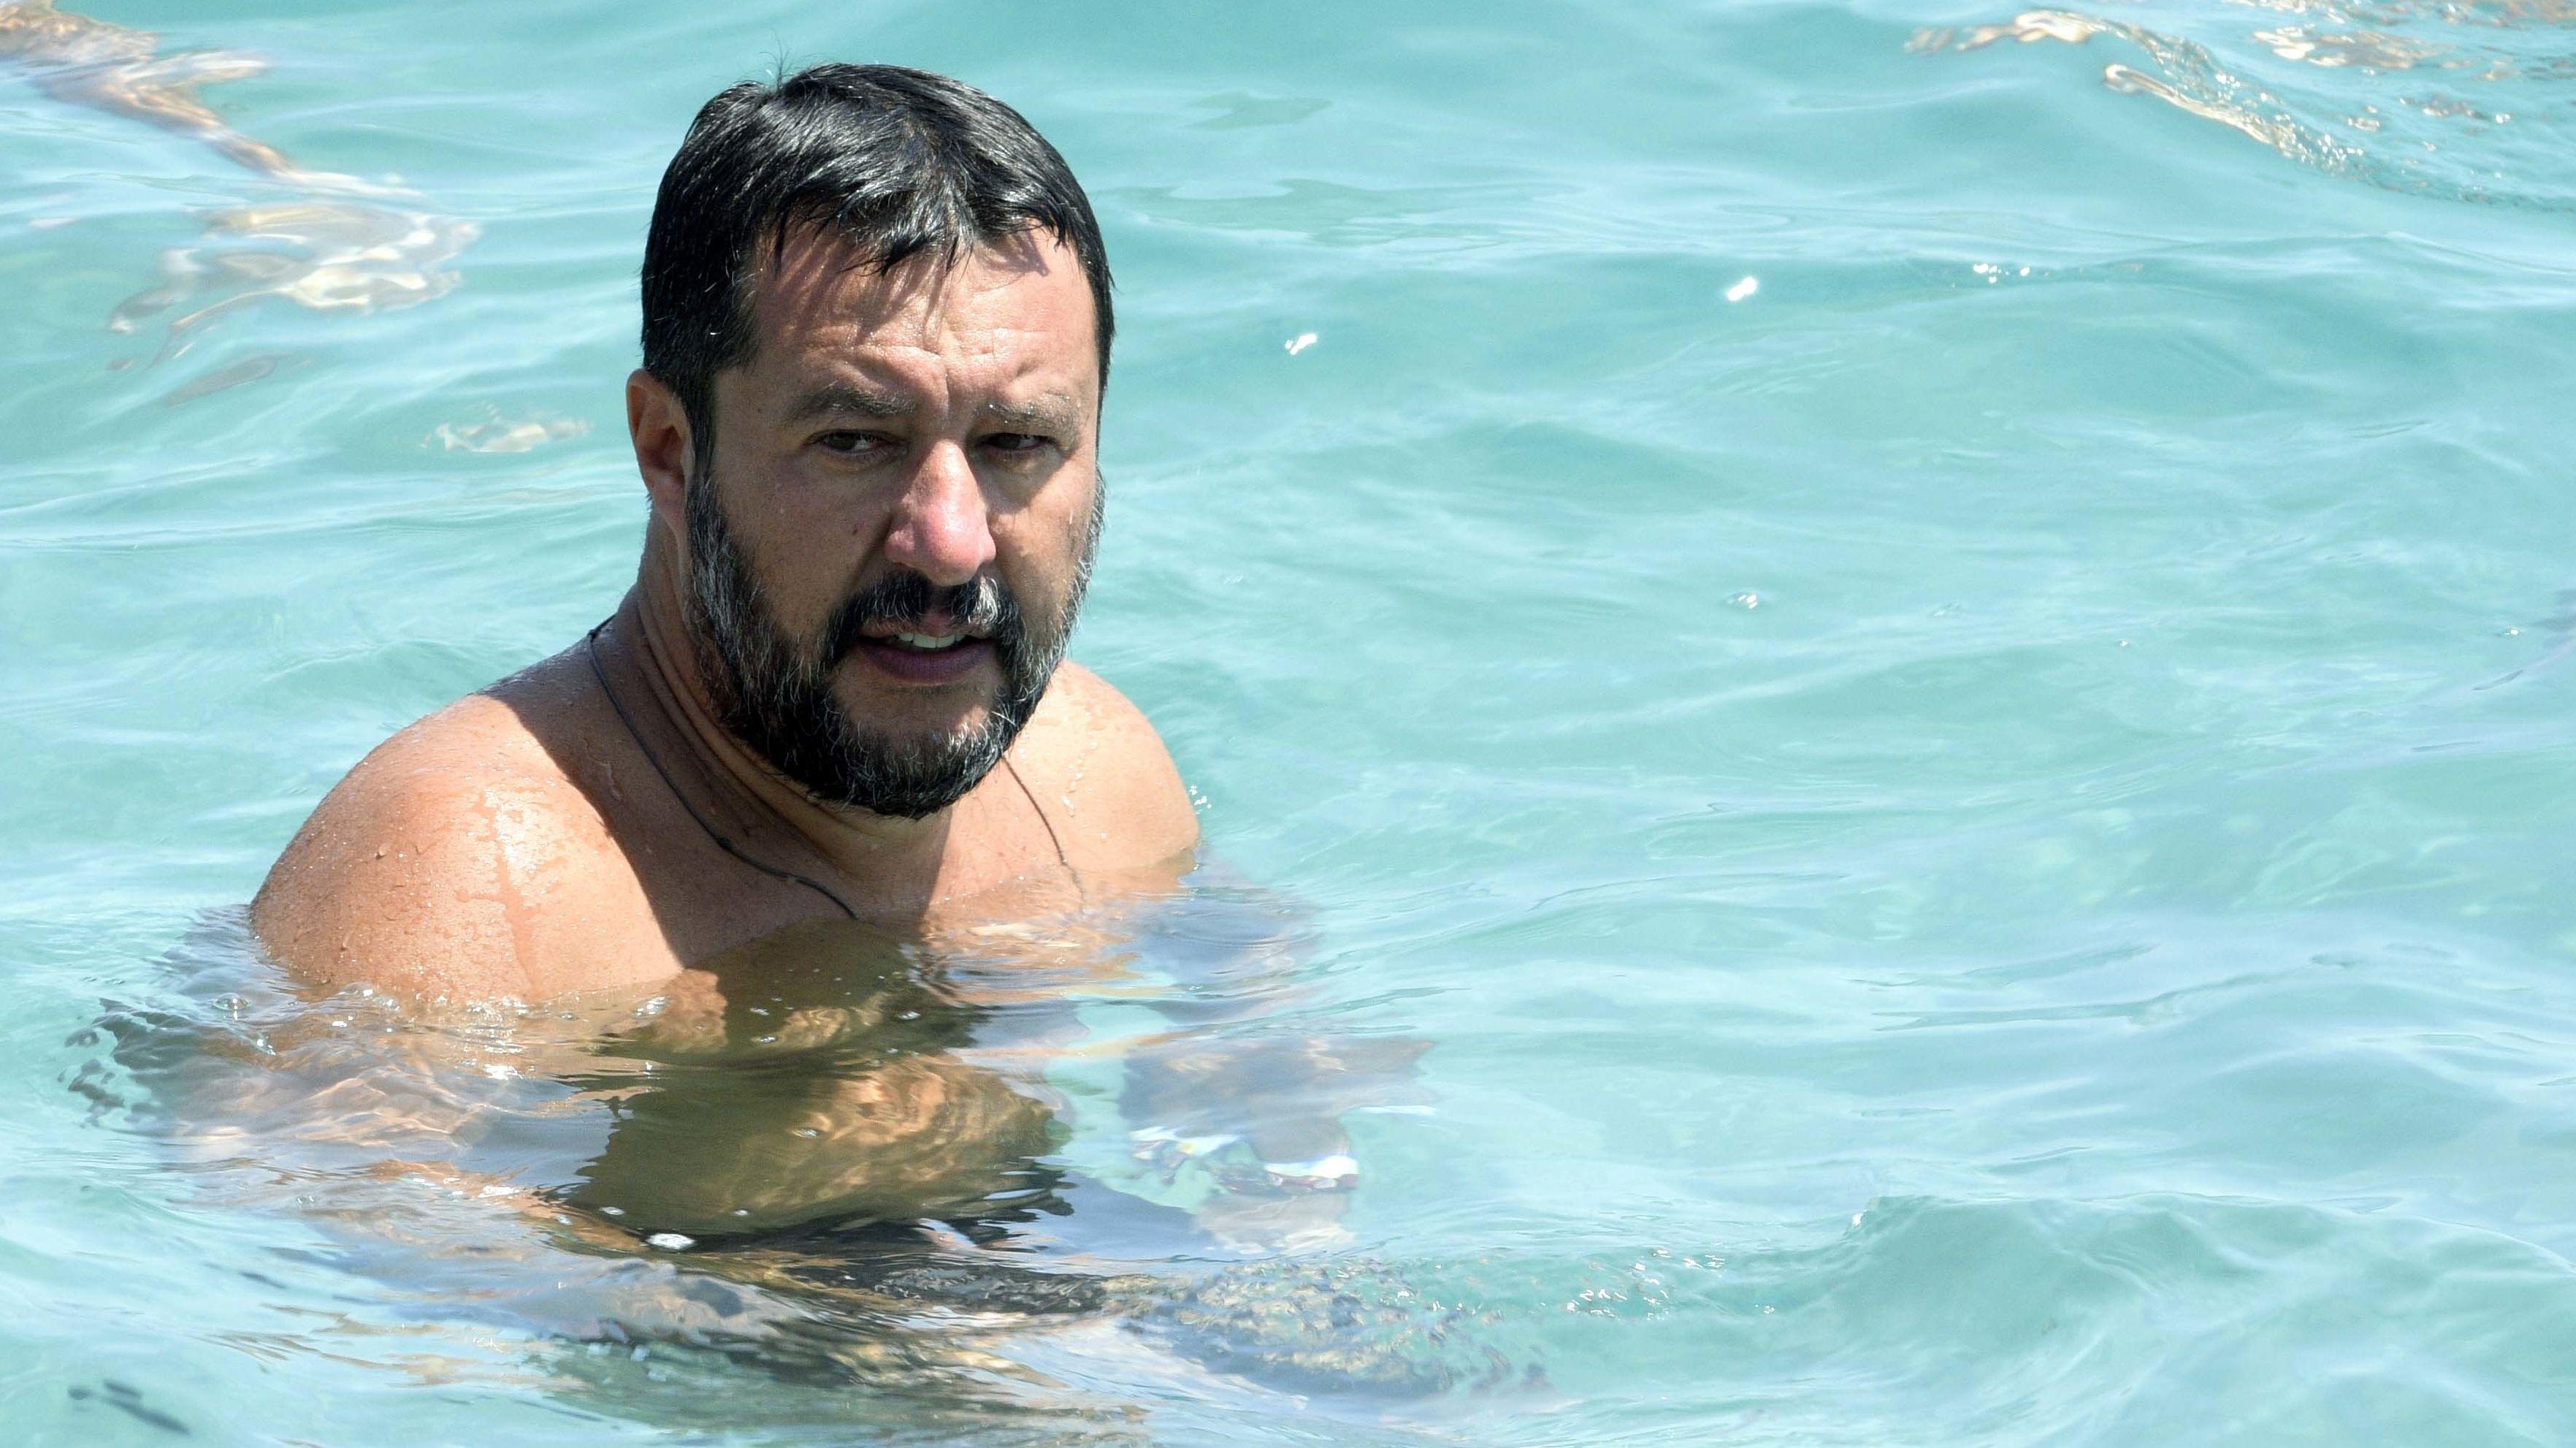 Matteo Salvini beim Bad im Meer